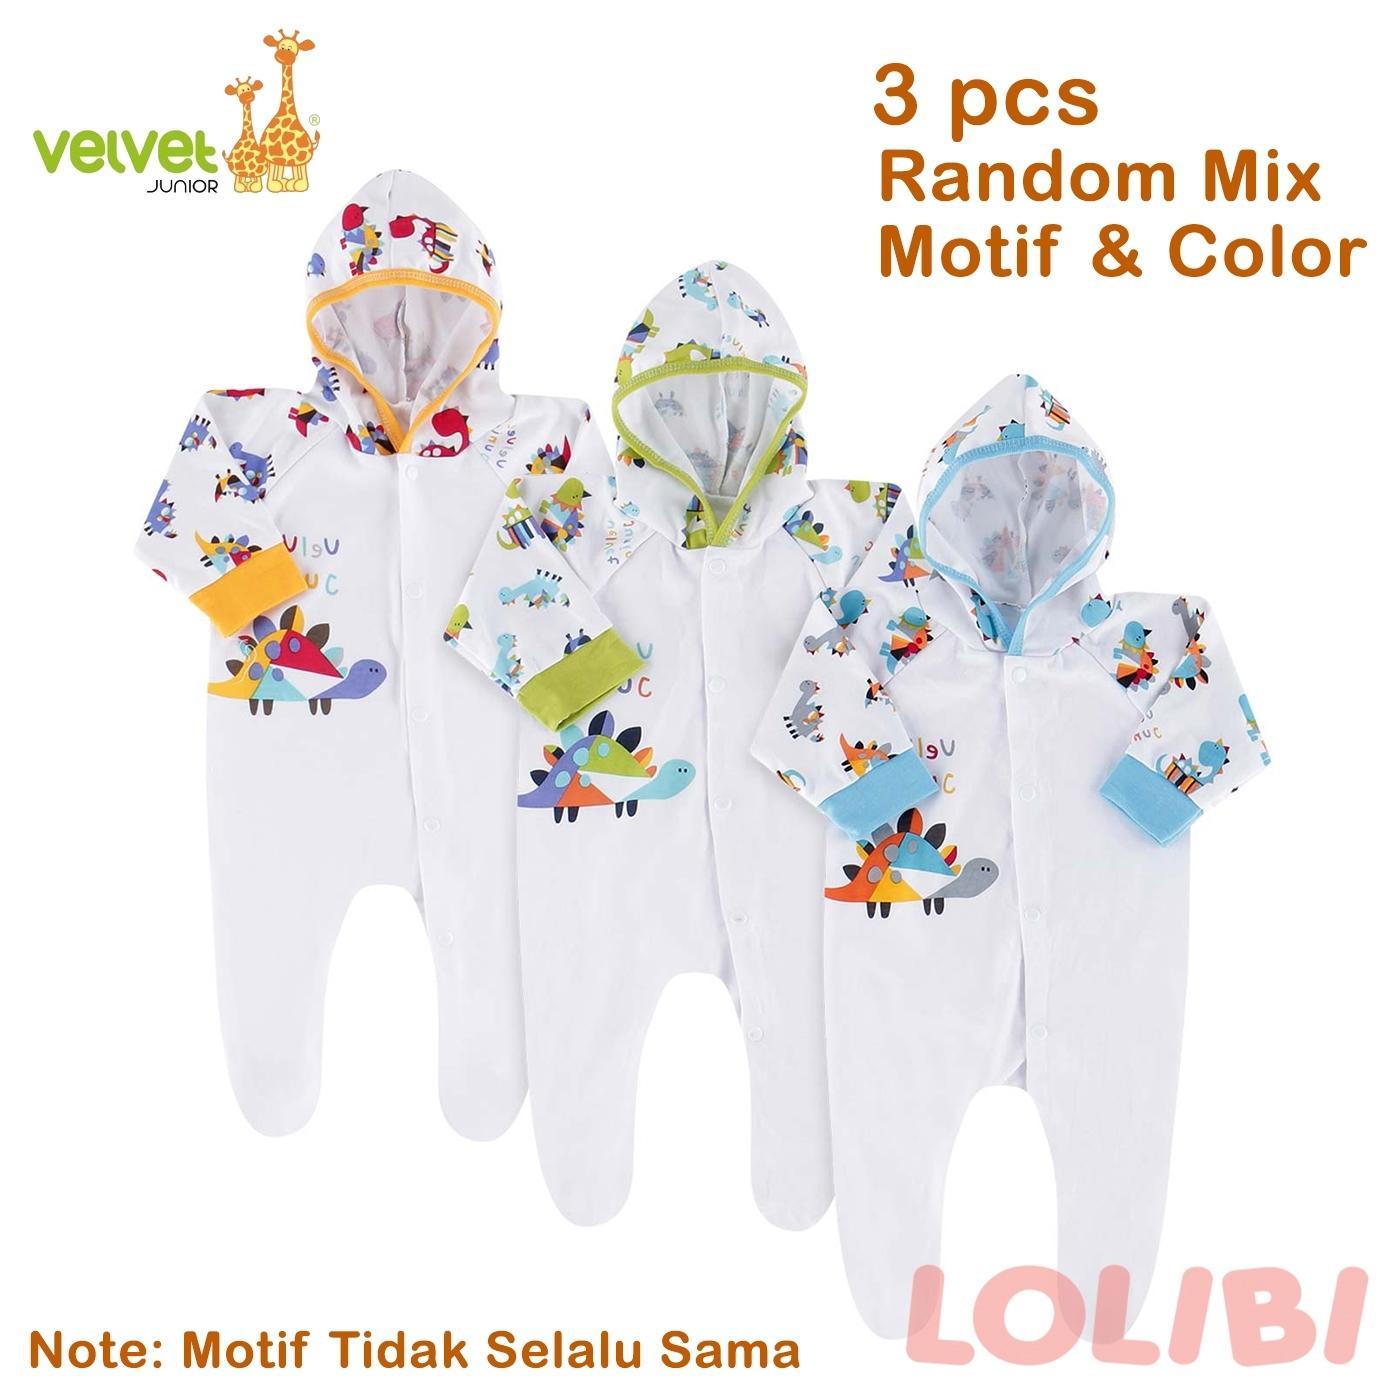 ... Pencarian Termurah Velvet Junior Playfull Random Motif Baju Kodok Topi Panjang TK NB 3 Pcs